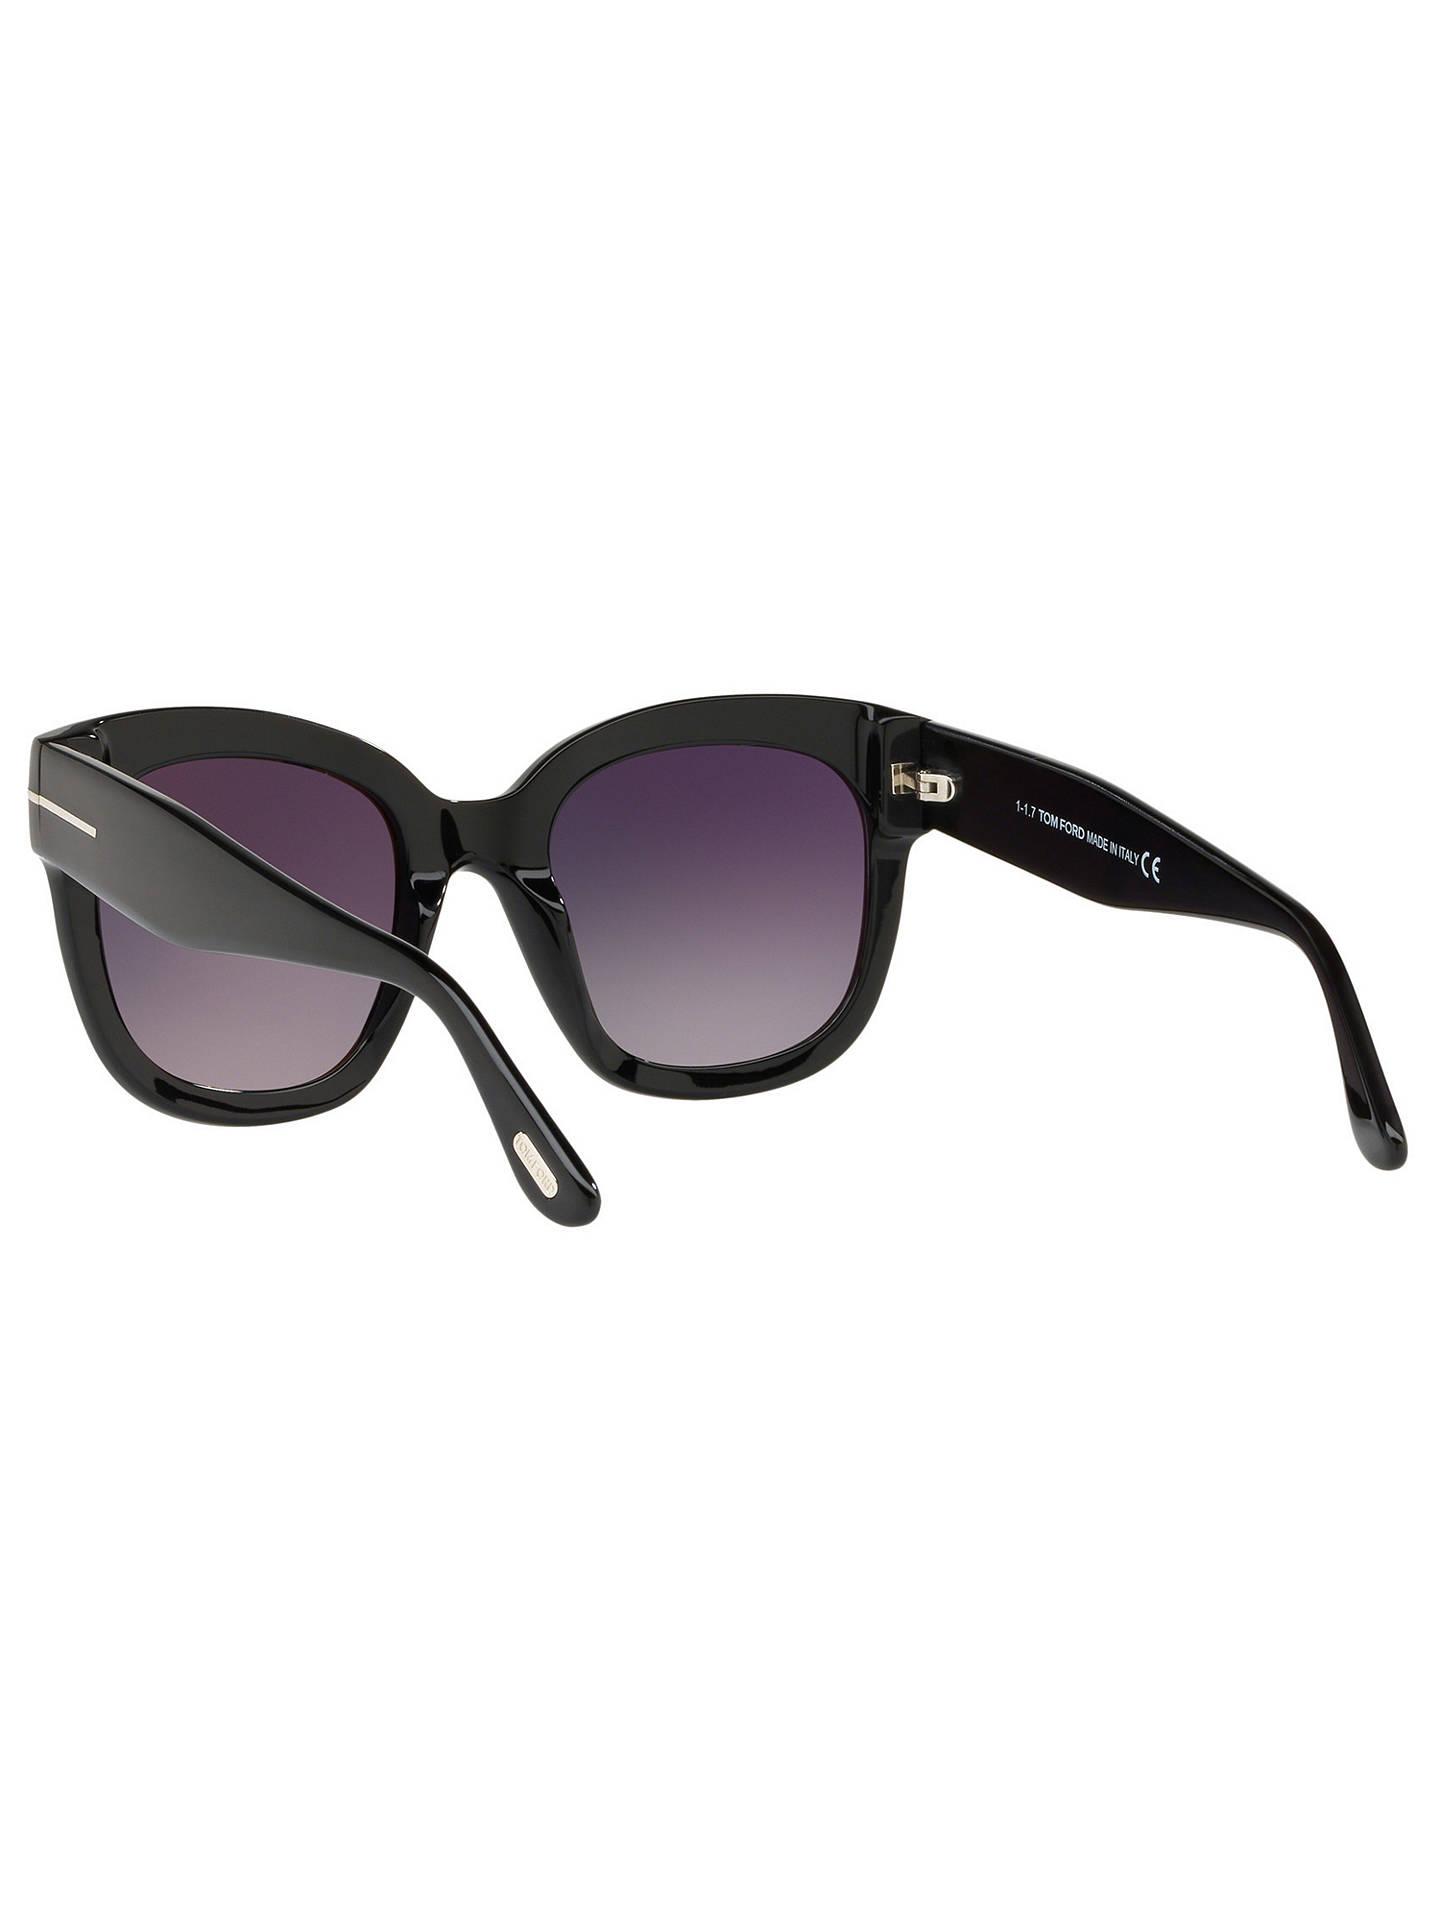 90fc70d3f7e0b ... Buy TOM FORD FT0613 Women s Beatrix-02 Square Sunglasses